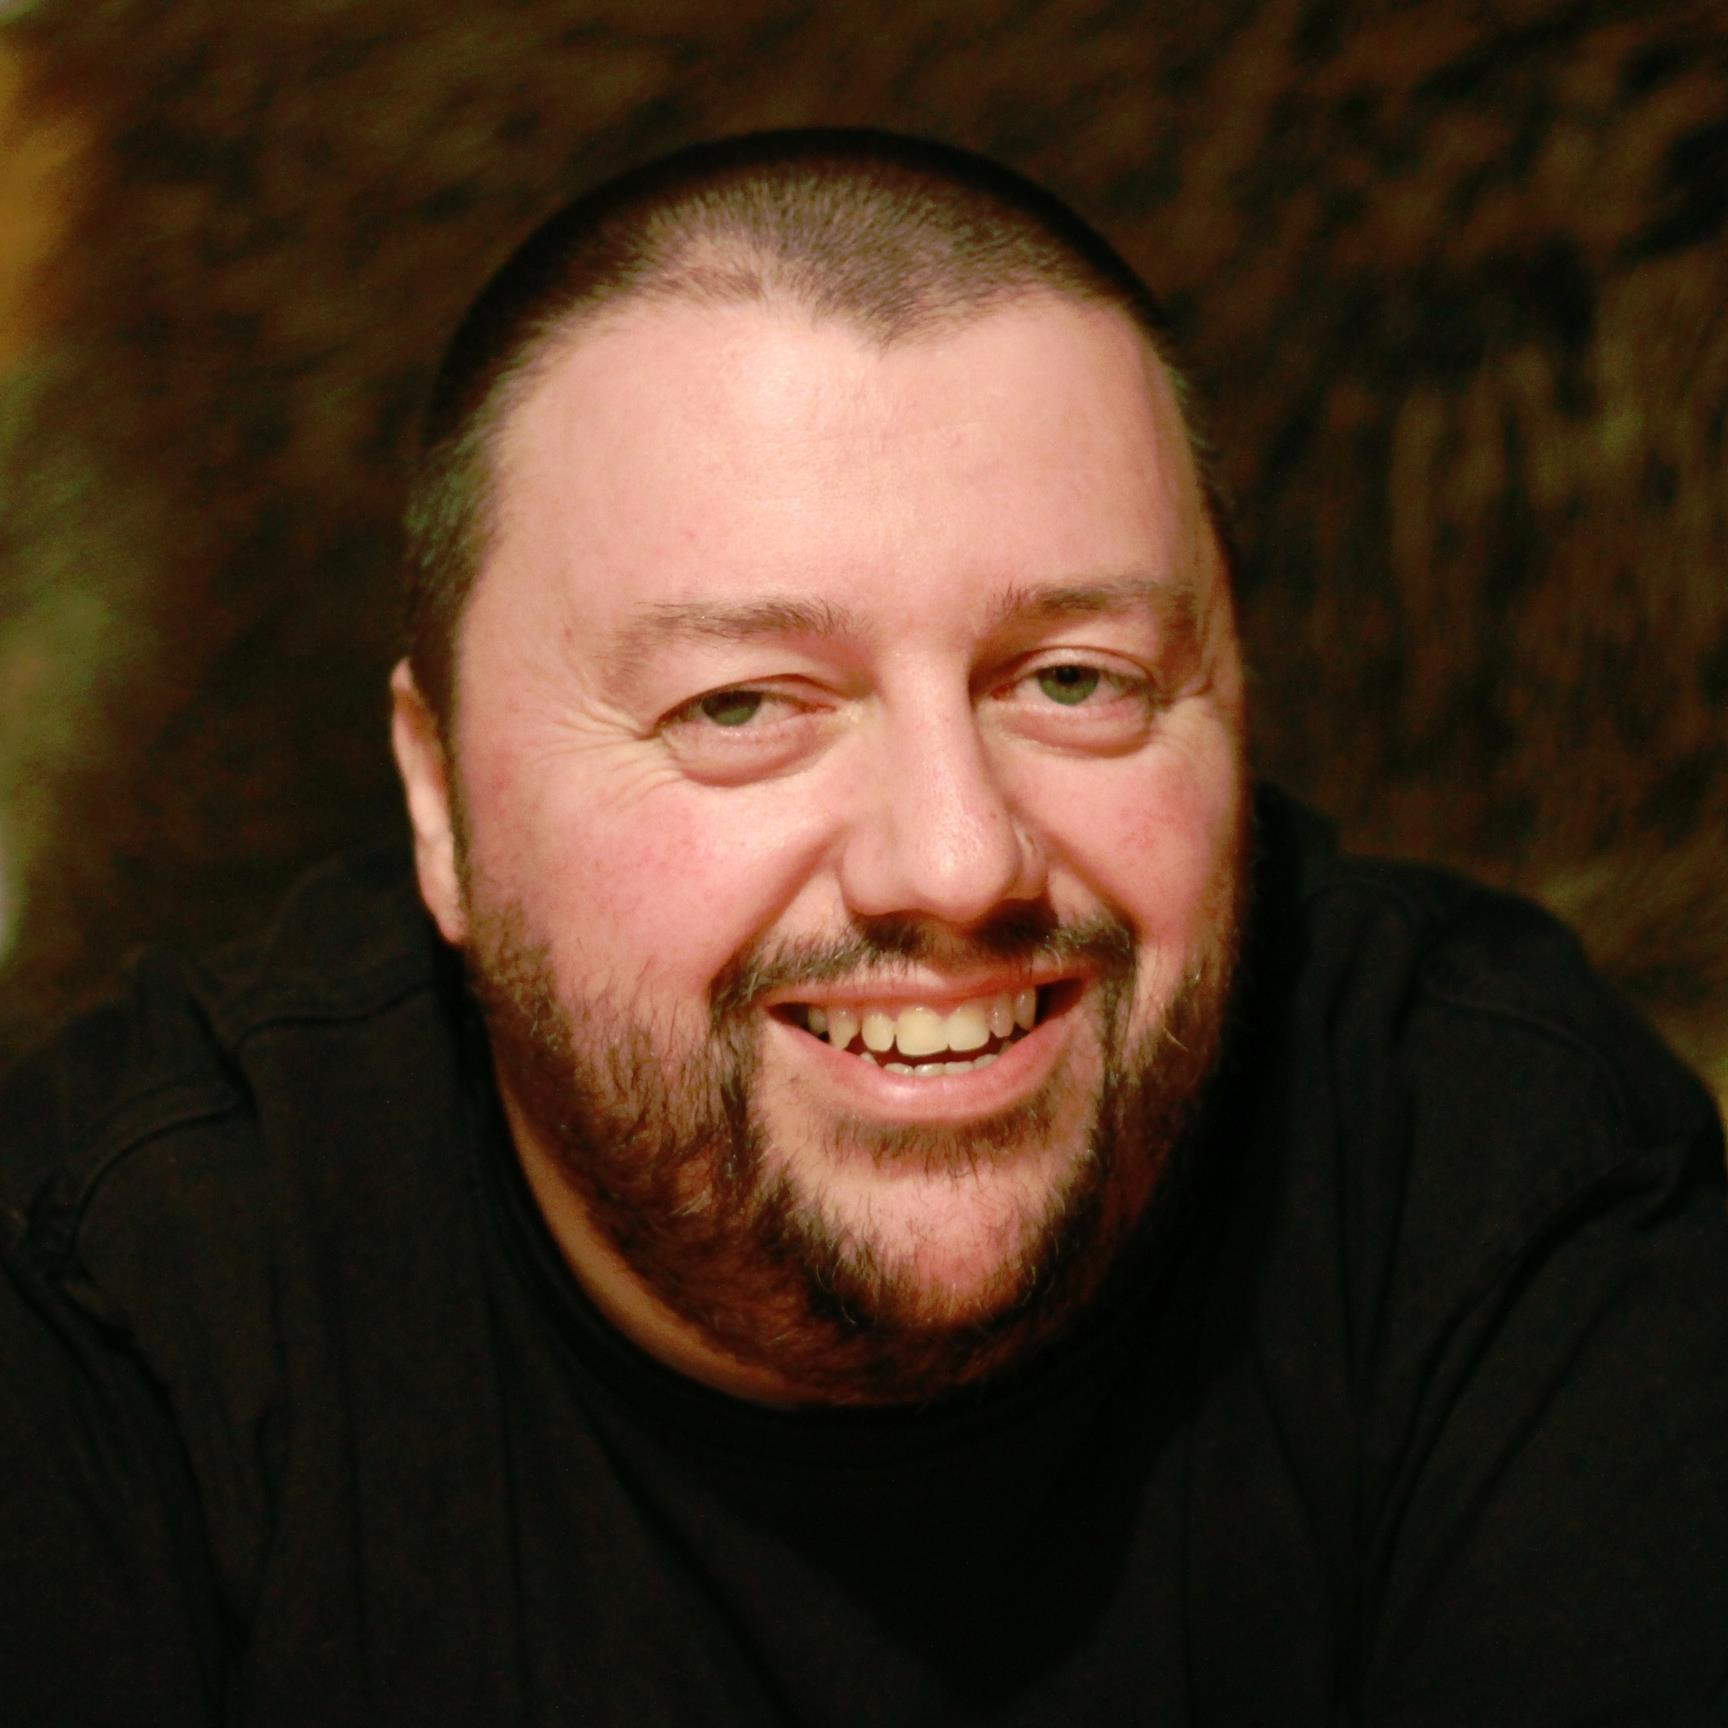 Pavel Sporek